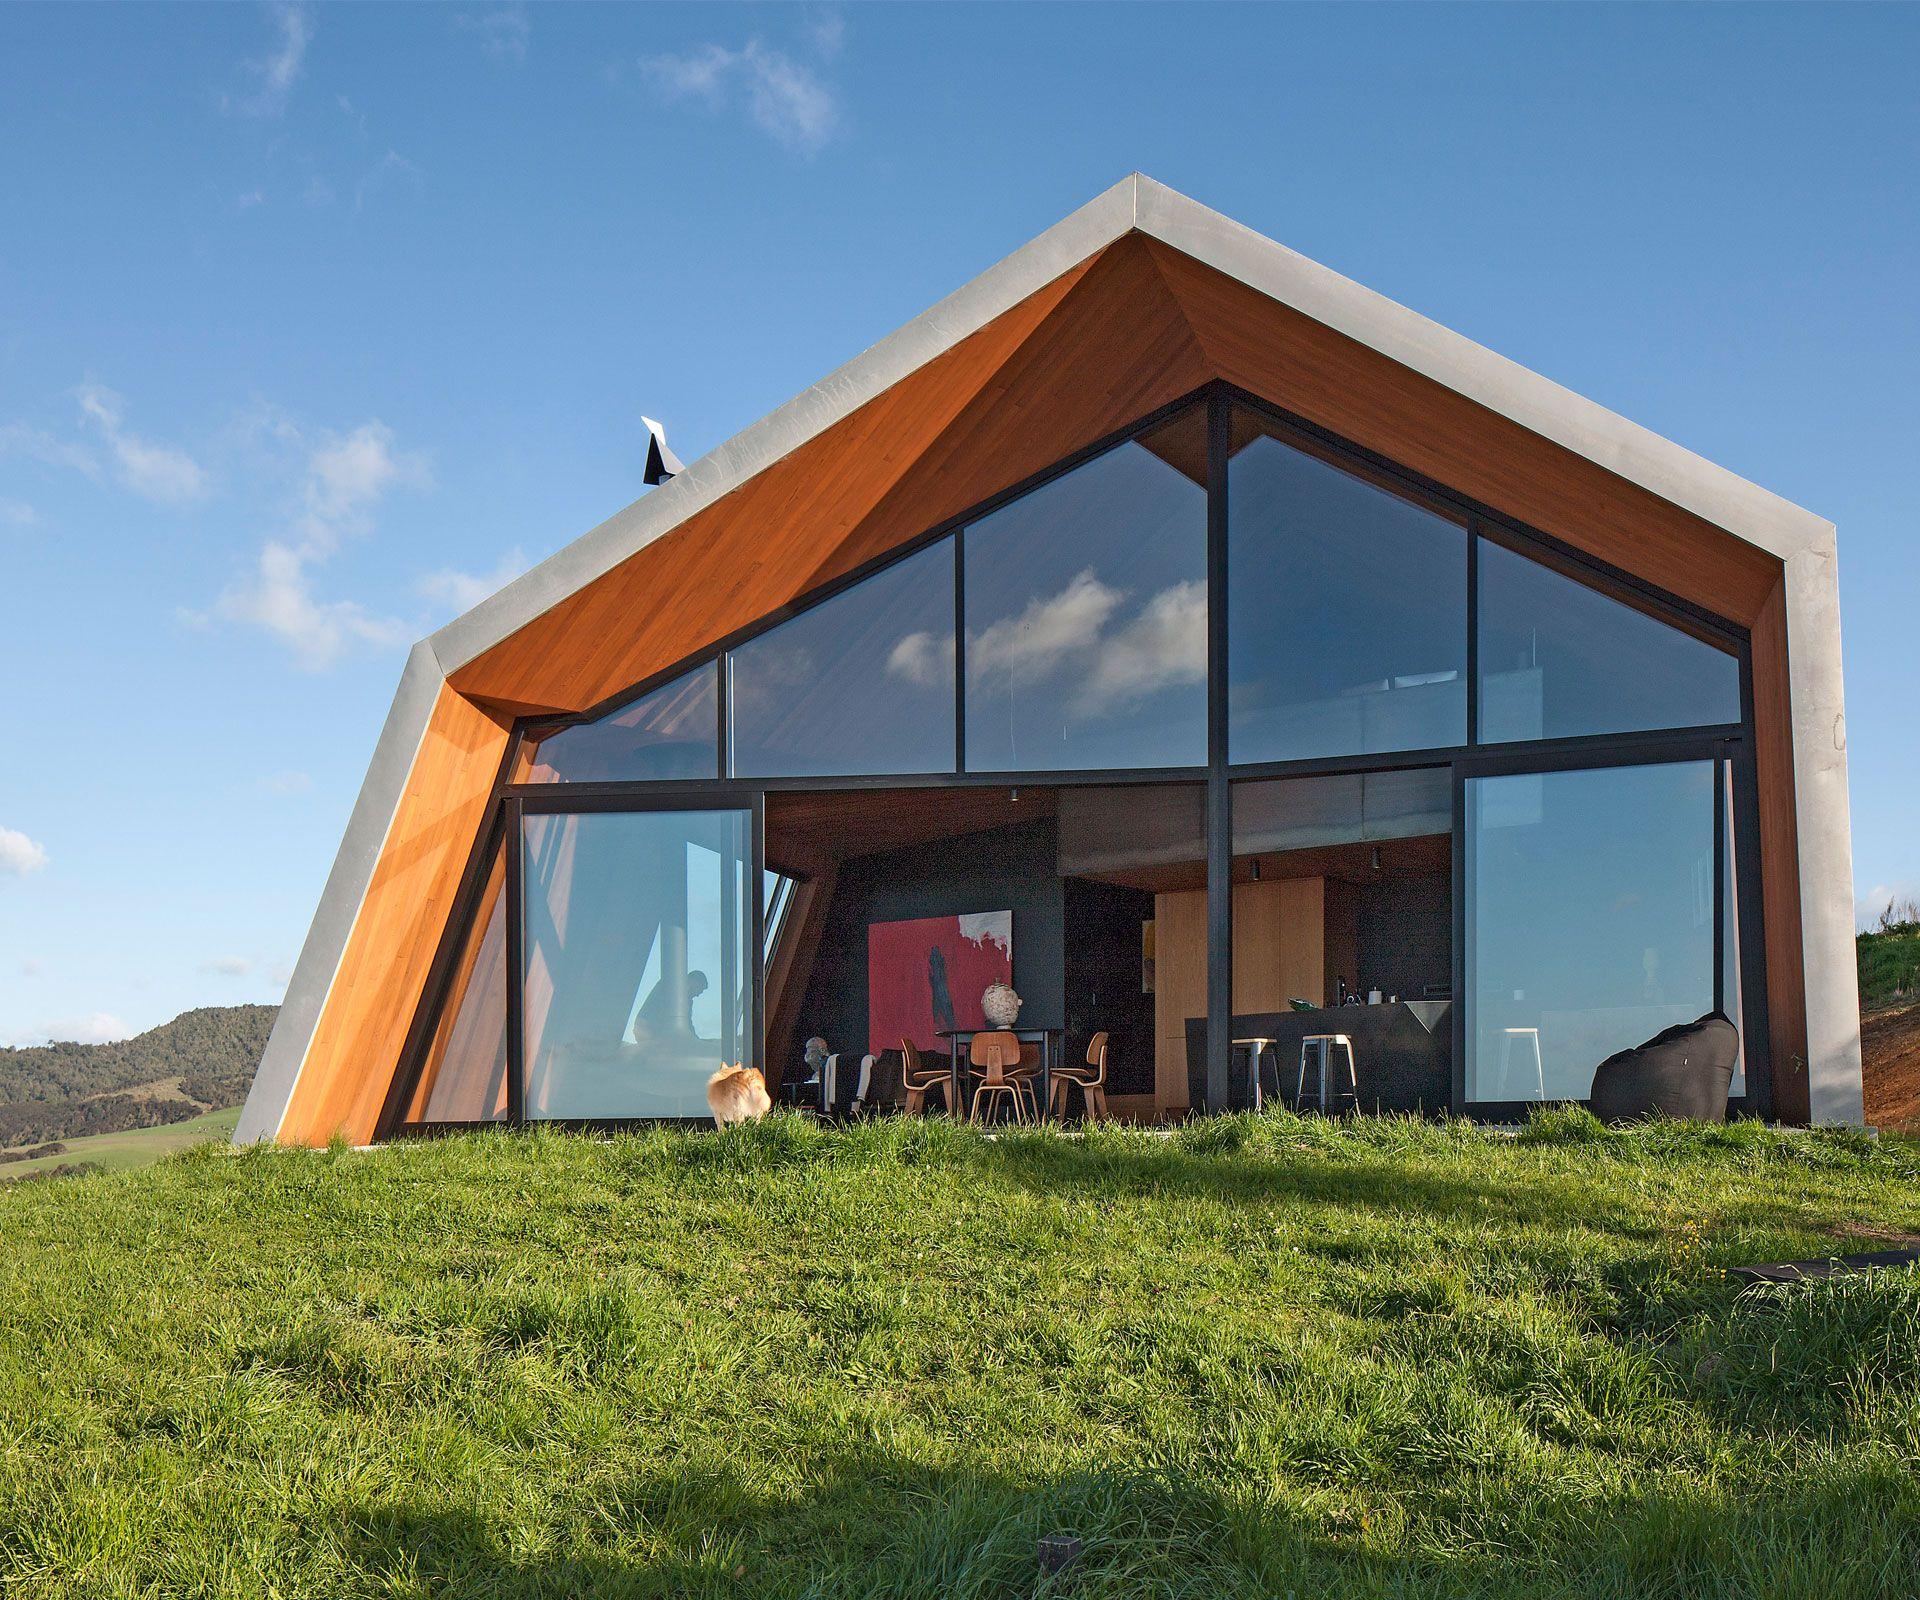 Kitchen Ideas New Zealand: Grand Design New Zealand - Google Search